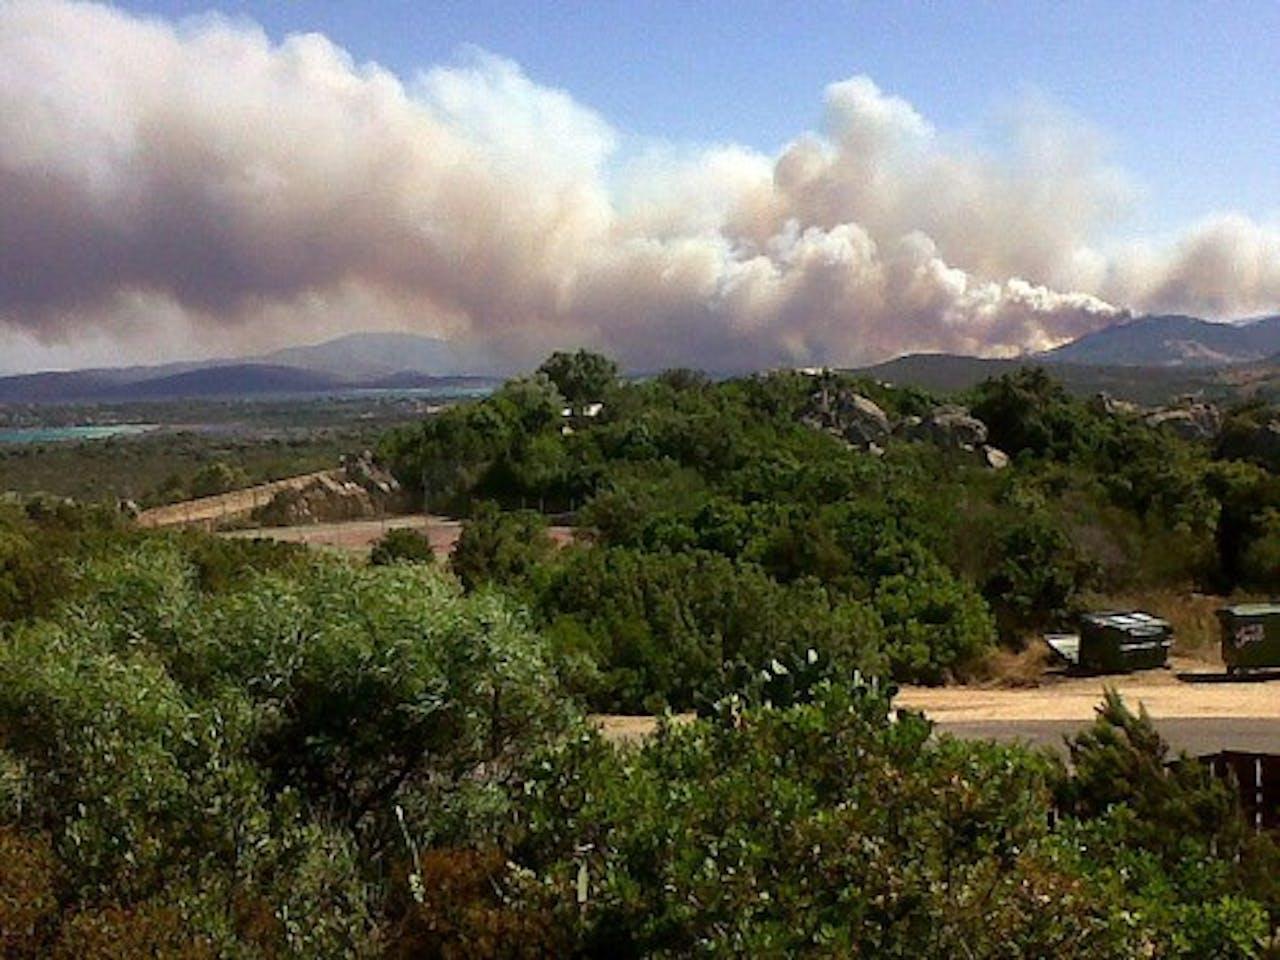 Archiefbeeld eerdere bosbrand op Sardinië. EPA